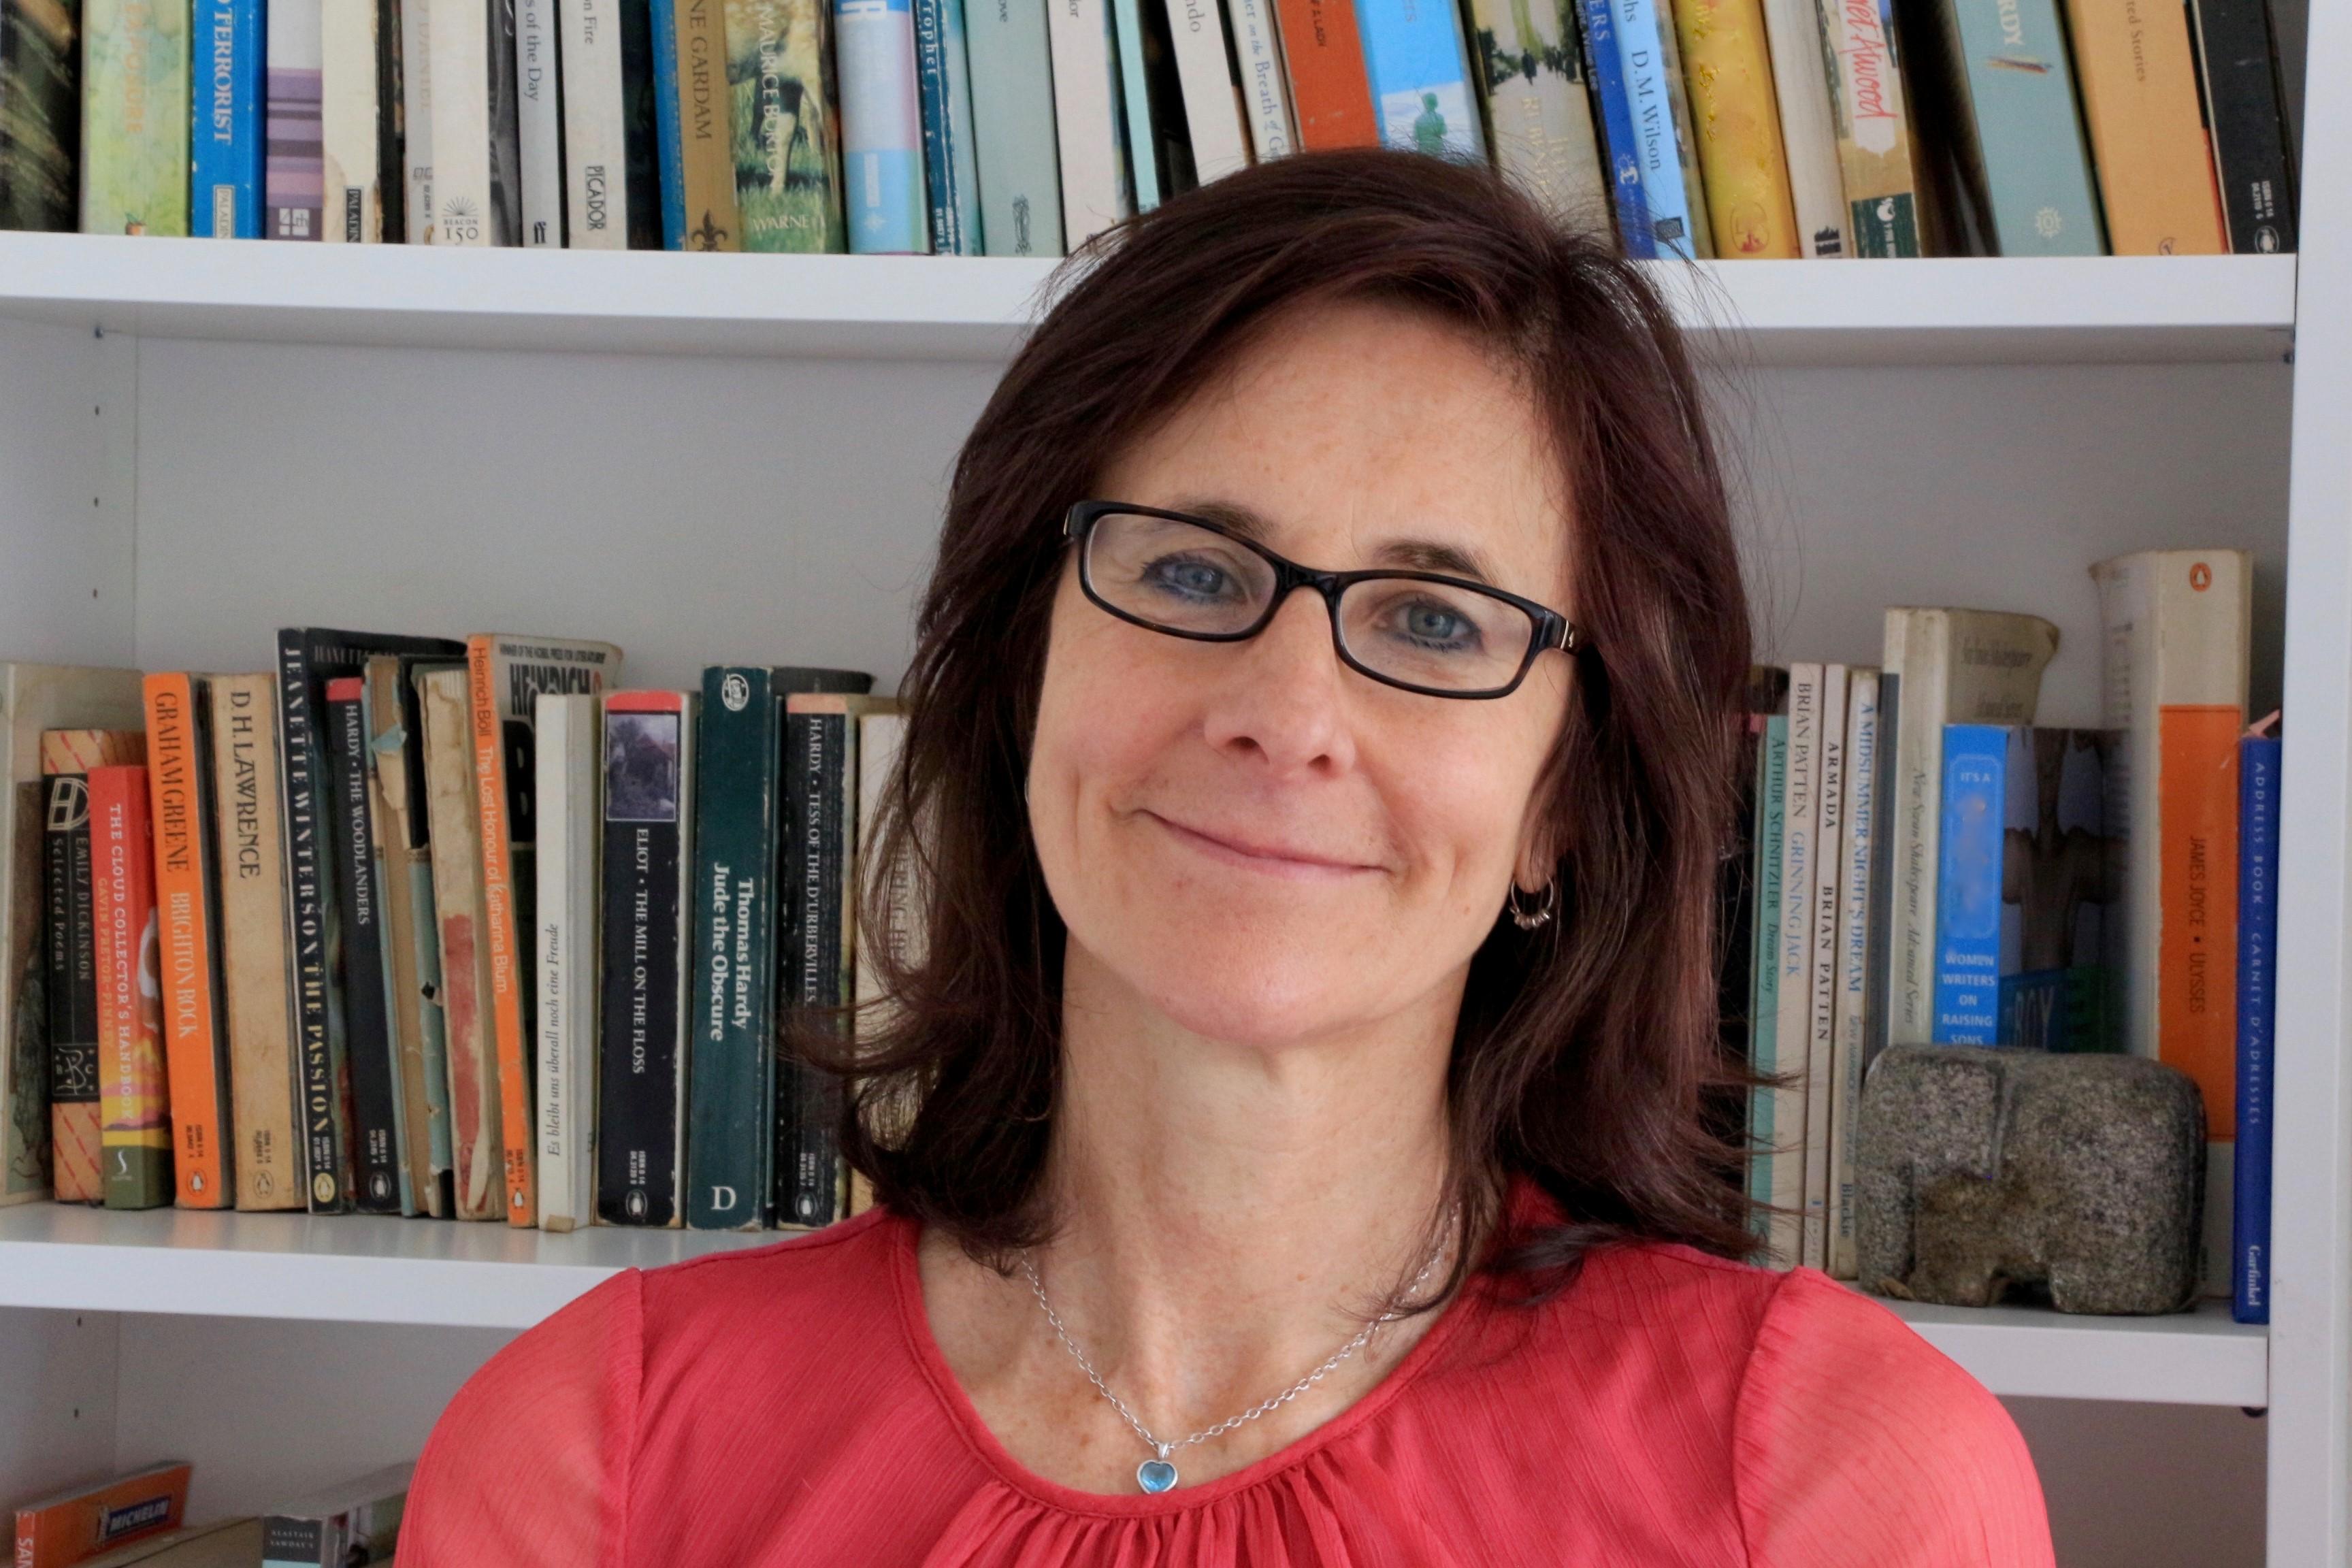 Caroline Pook